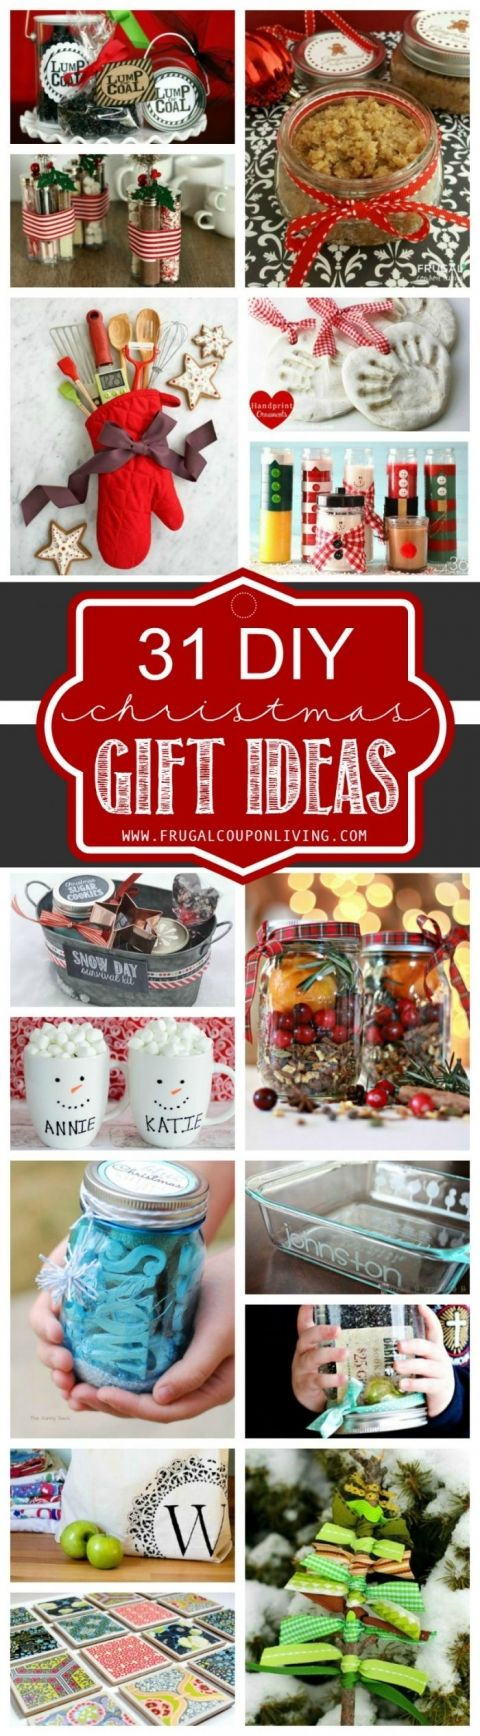 31 DIY Christmas Gift Ideas on Frugal Coupon Living